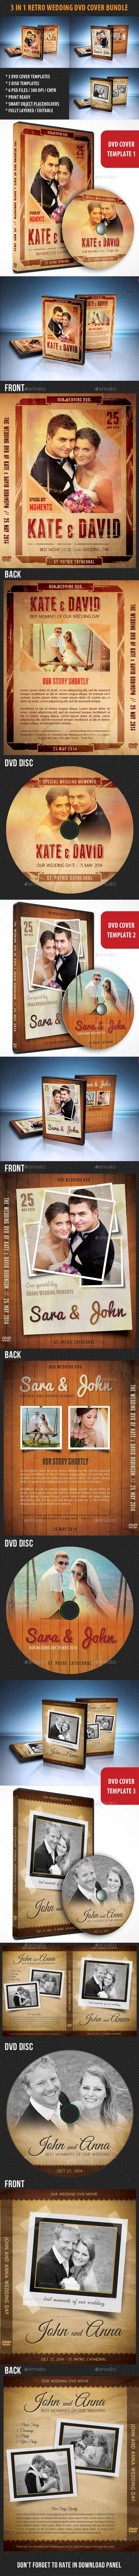 3 in 1 Retro Wedding DVD Cover Bundle - CD & DVD Artwork Print Templates